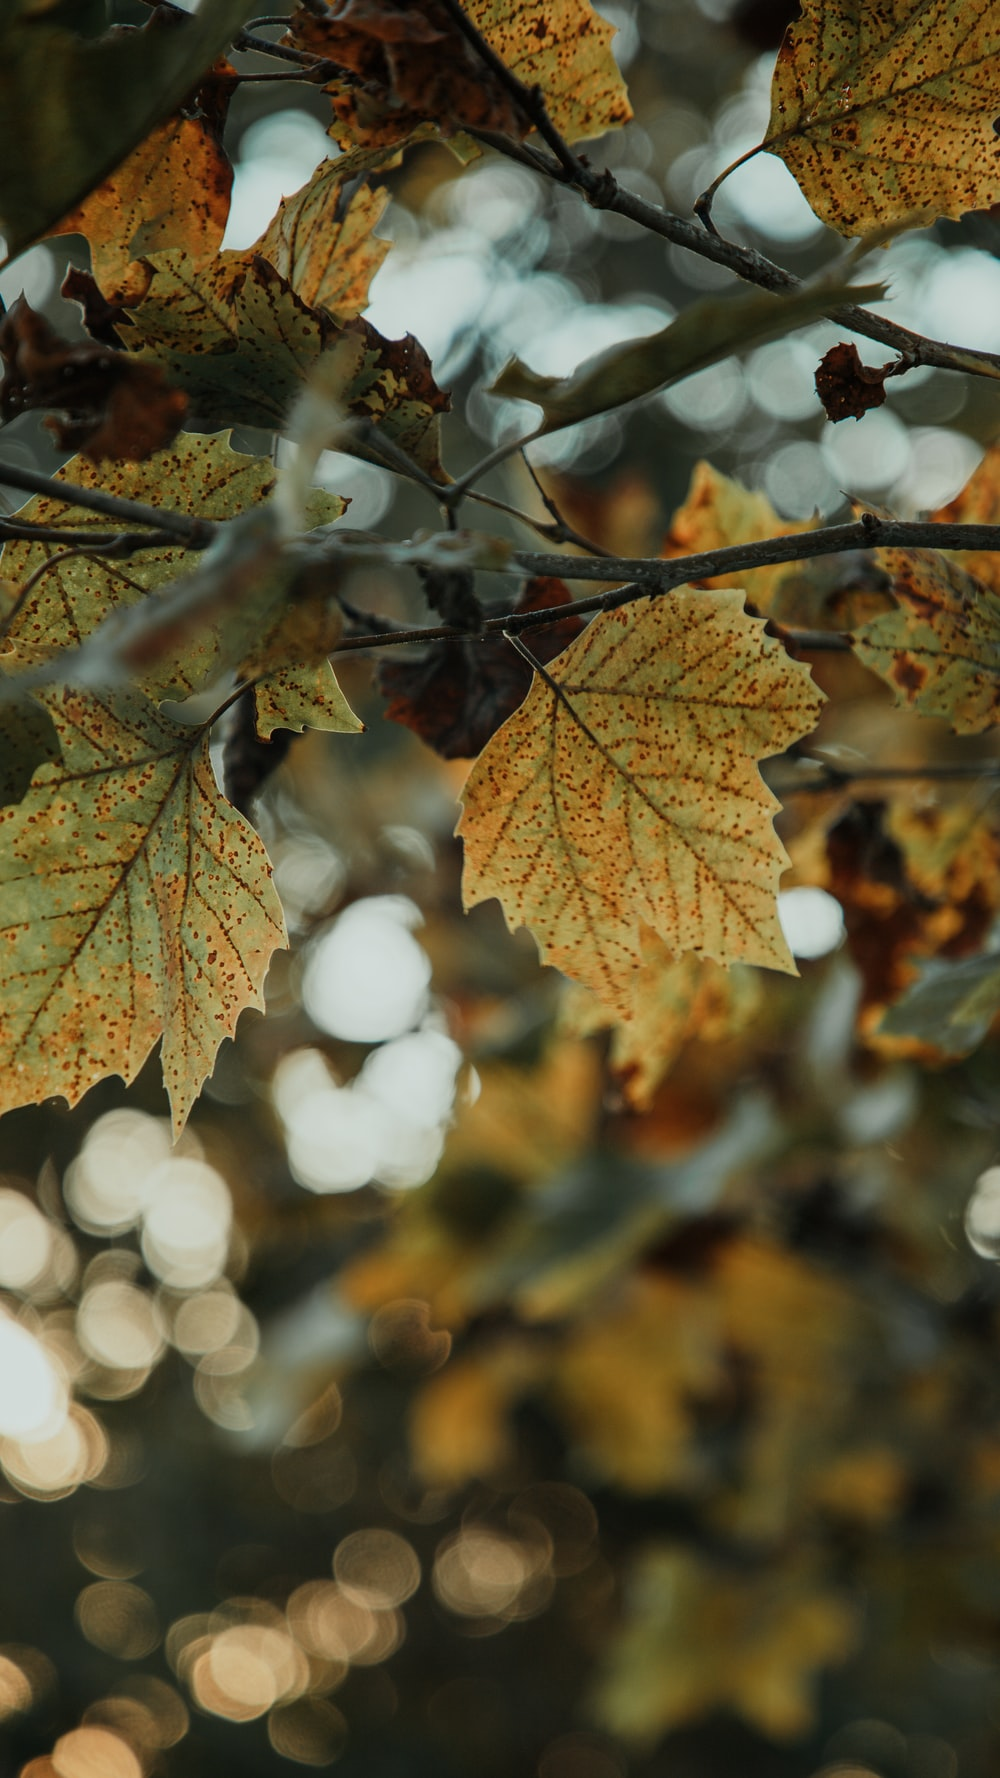 beige leafed plant